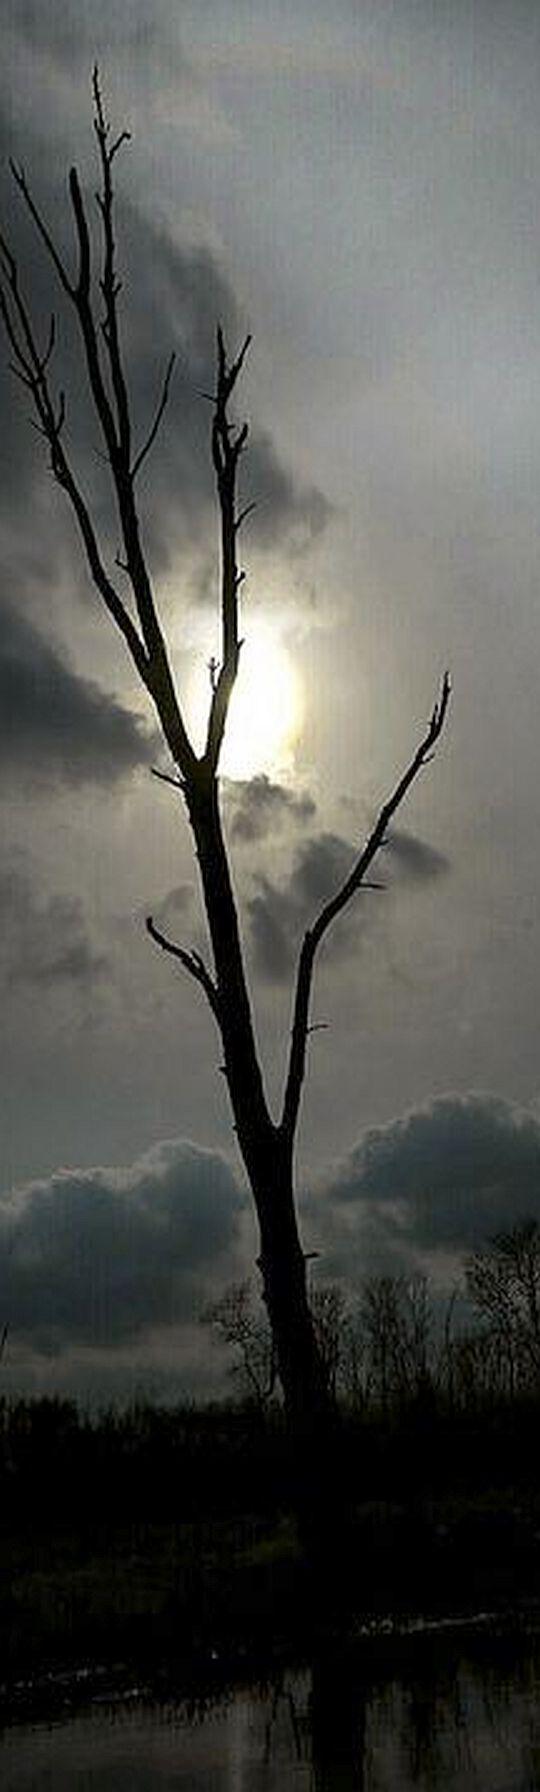 MYSTERY LANDSCAPE - TREE  #photo by Alyssa Elefteriou #fog foggy